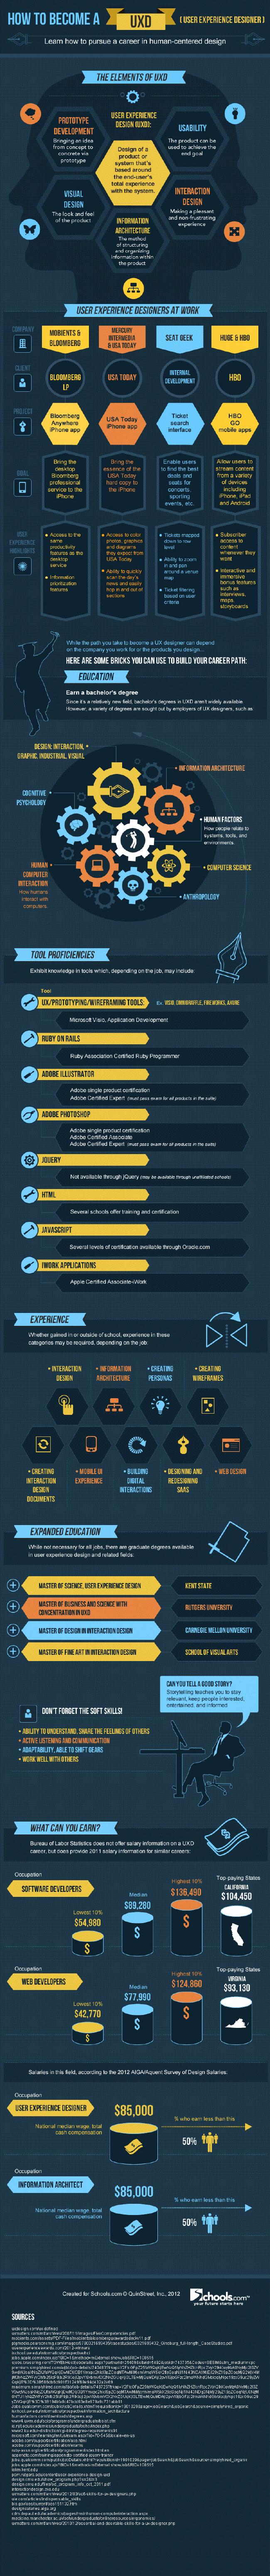 Career in UXD-Infographic